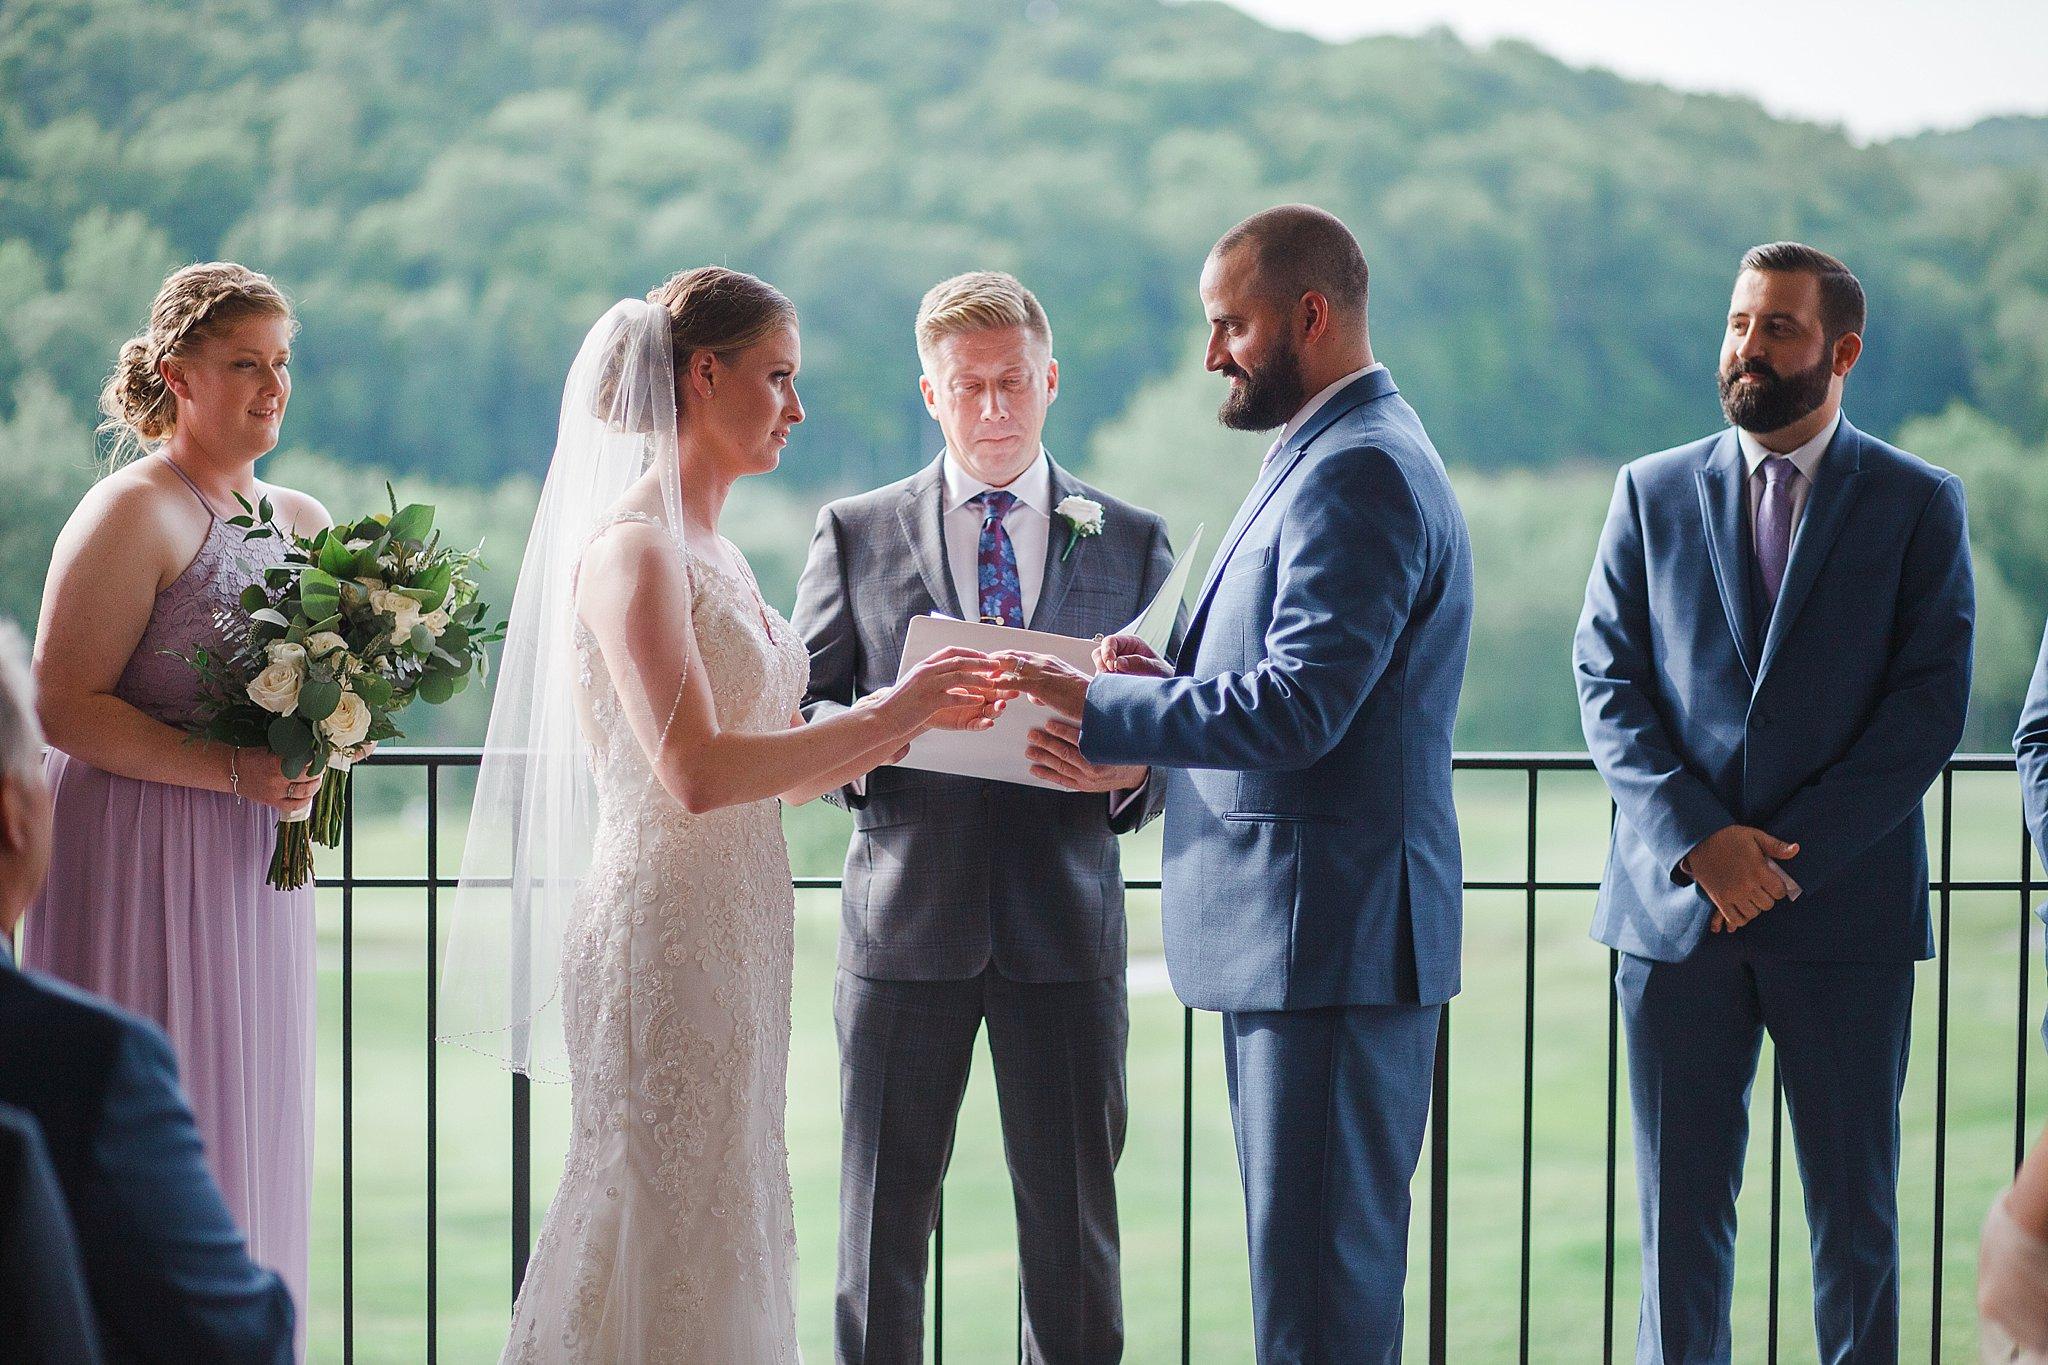 Hollow Brook Golf Club Cortlandt Manor NY Wedding Sweet Alice Photography June Wedding84.jpg